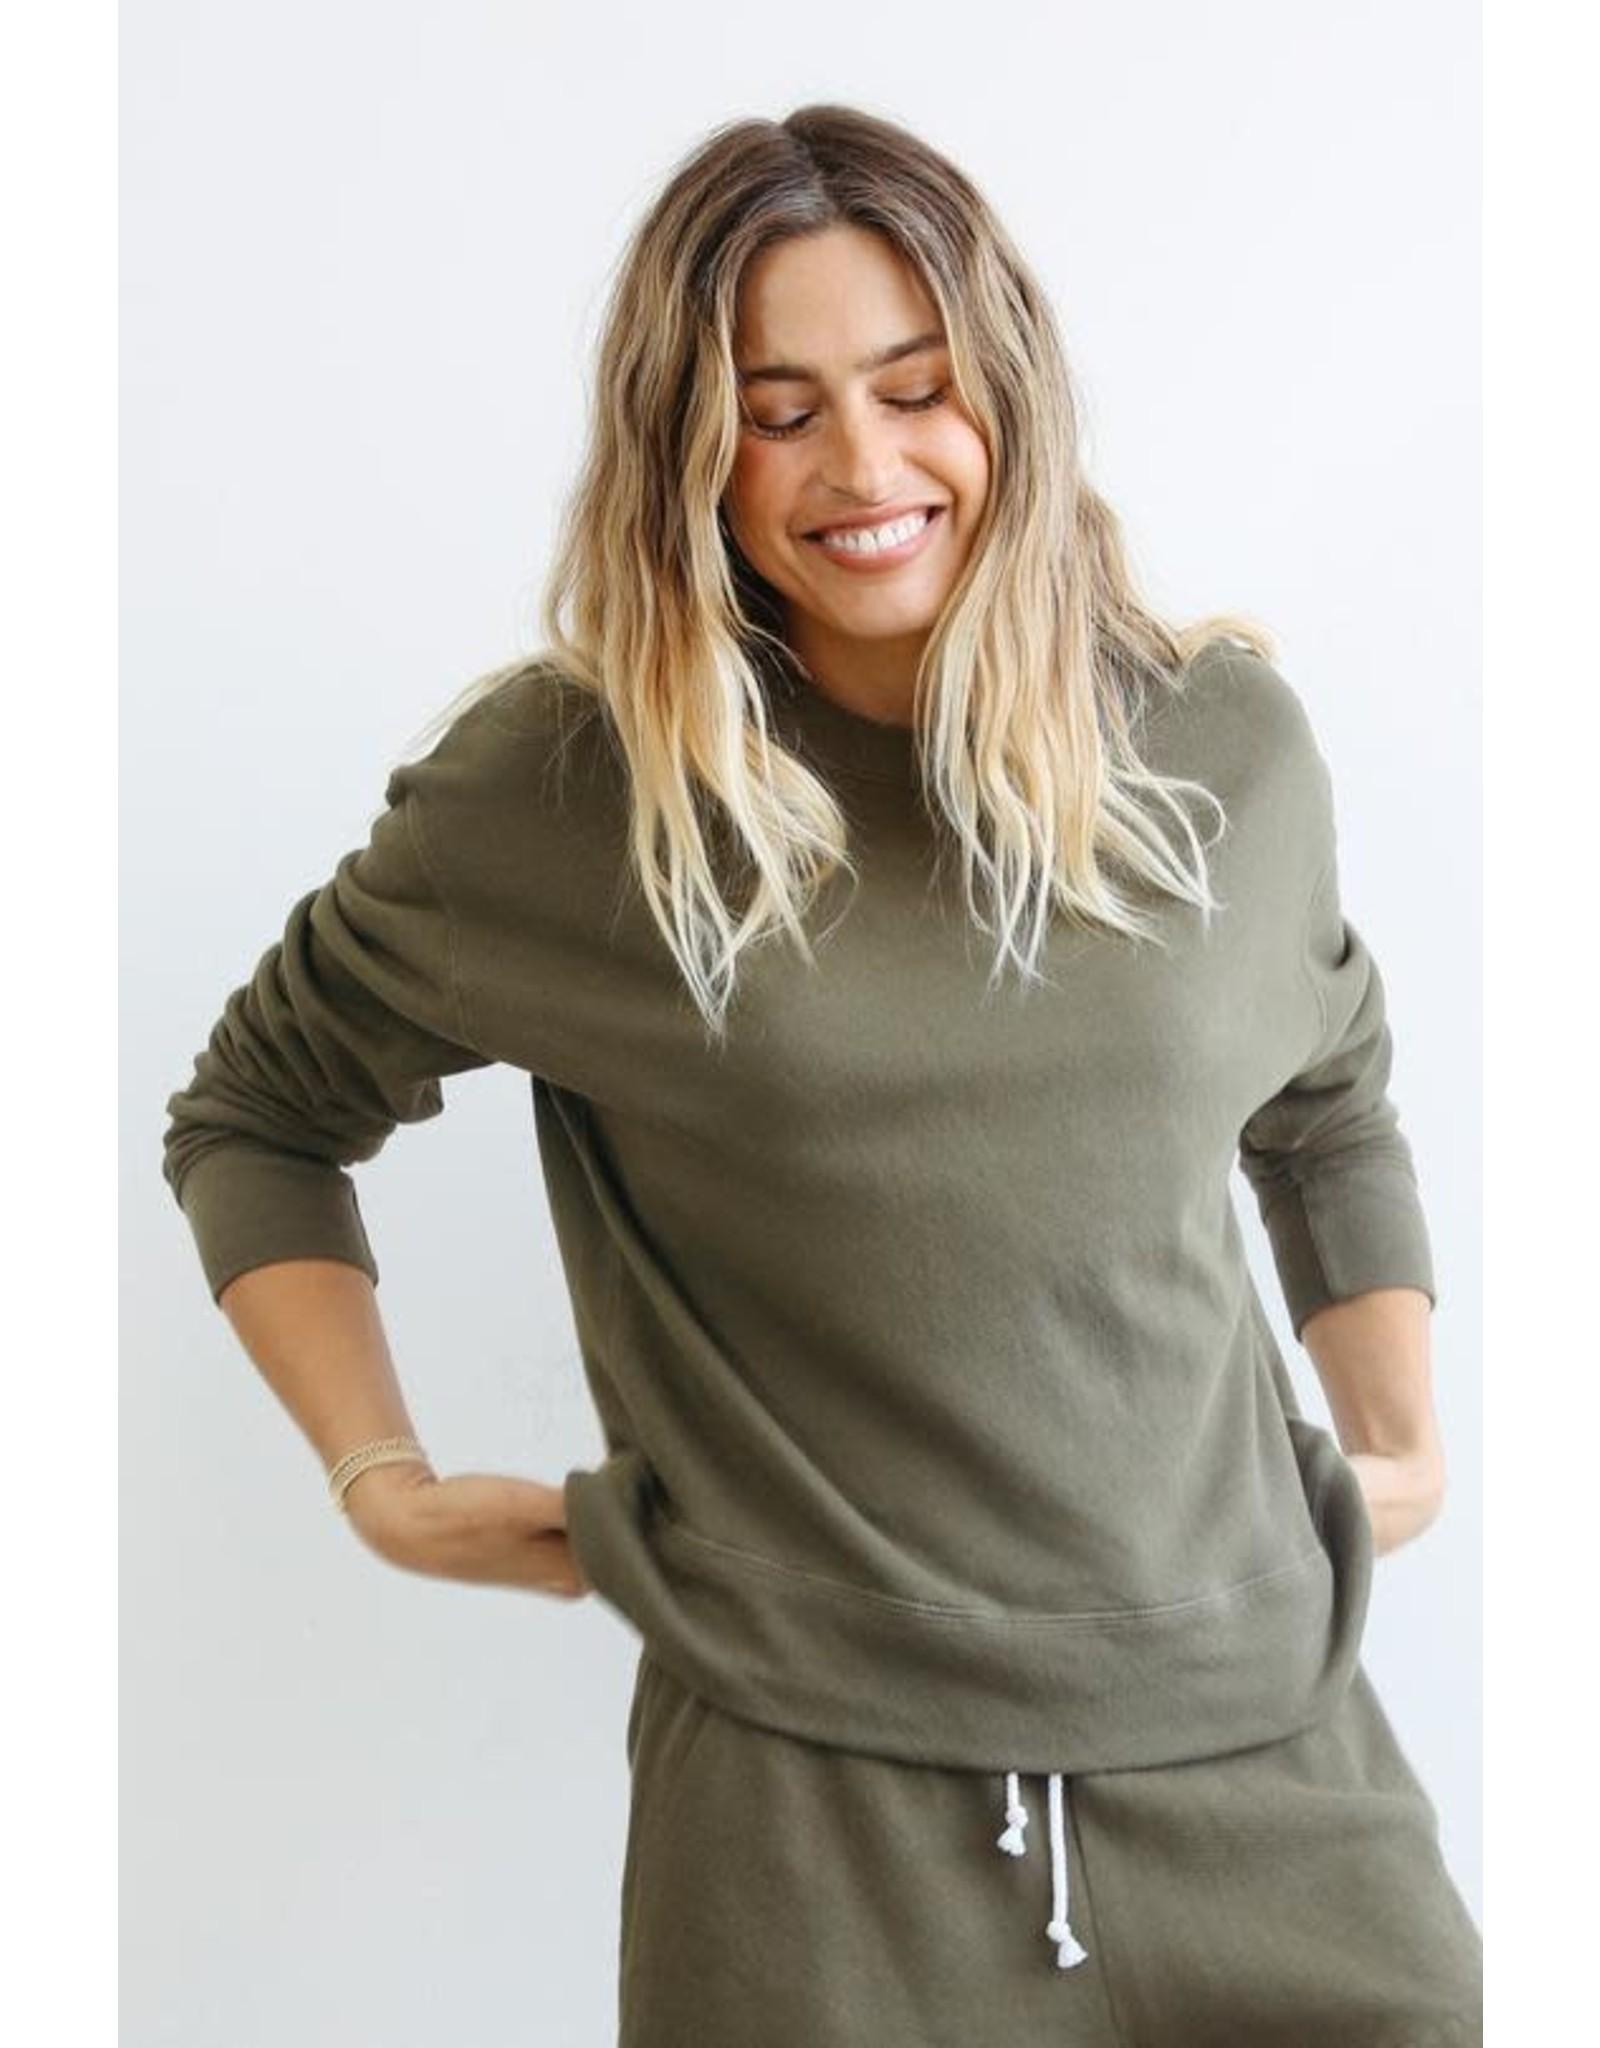 PeRFECT WHITE TEE PWT pullover sweatshirt